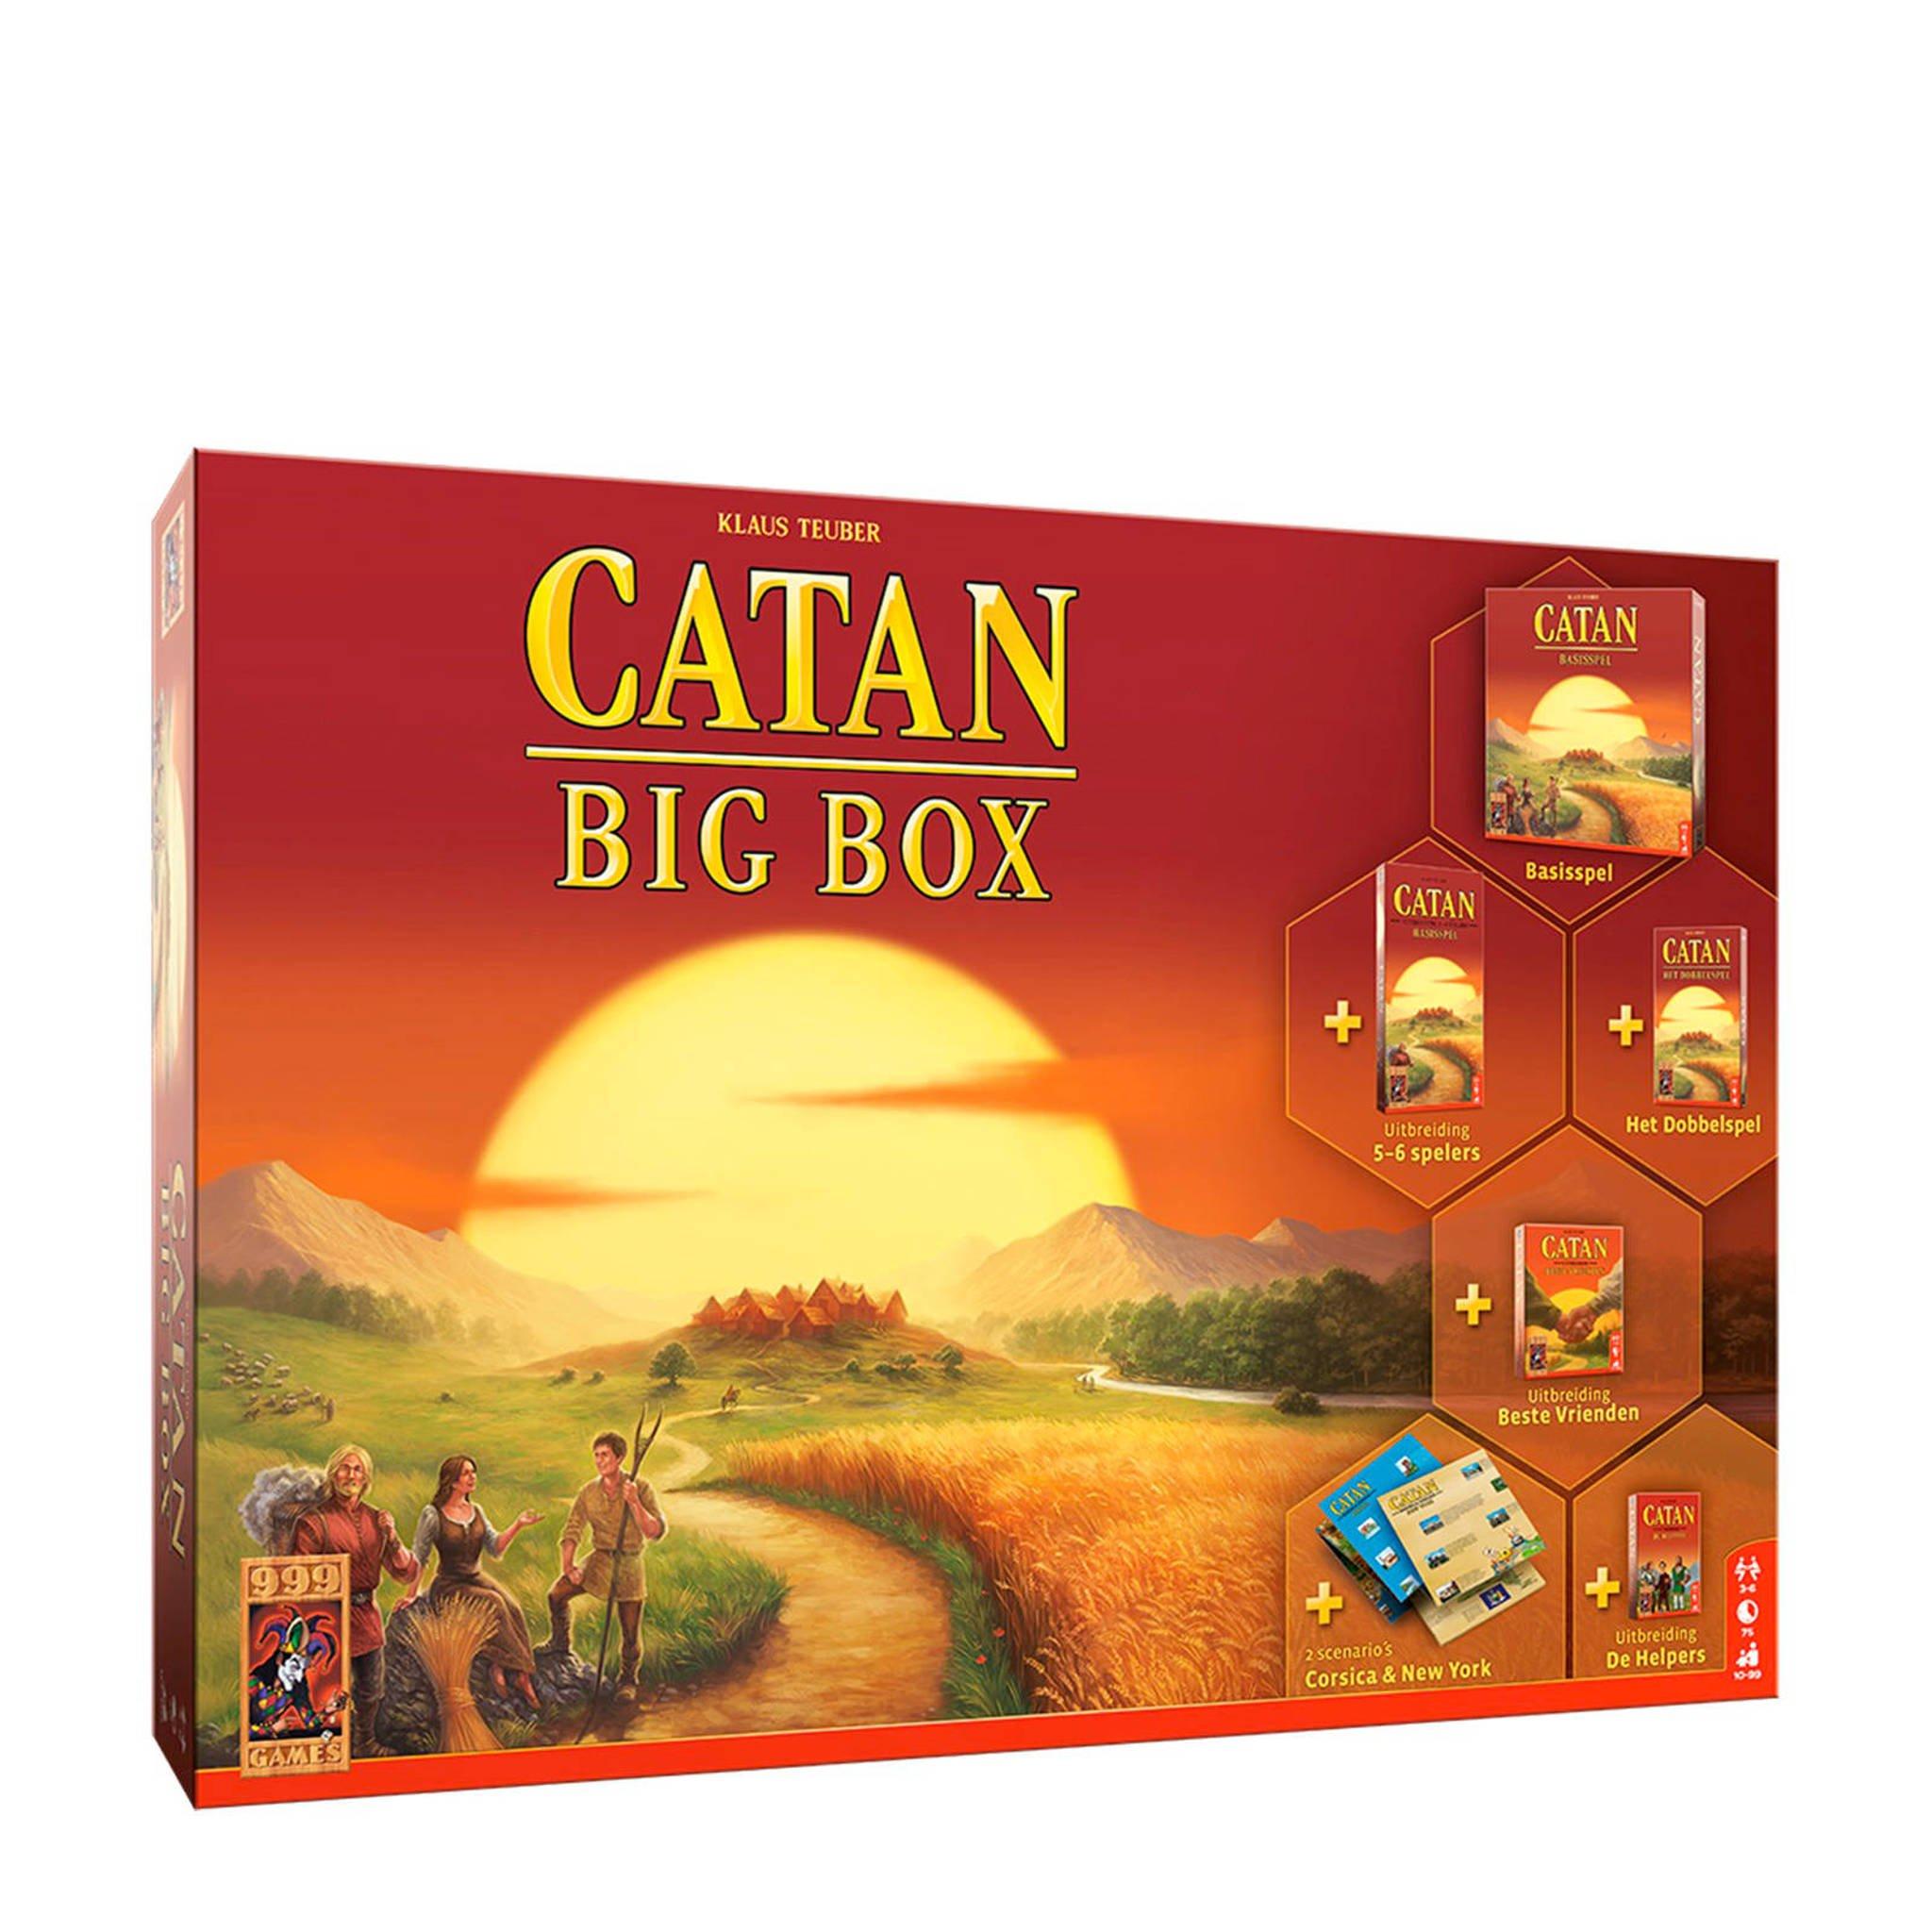 Catan Big Box (2019 ed.) voor €45 @ wehkamp [dagdeal]